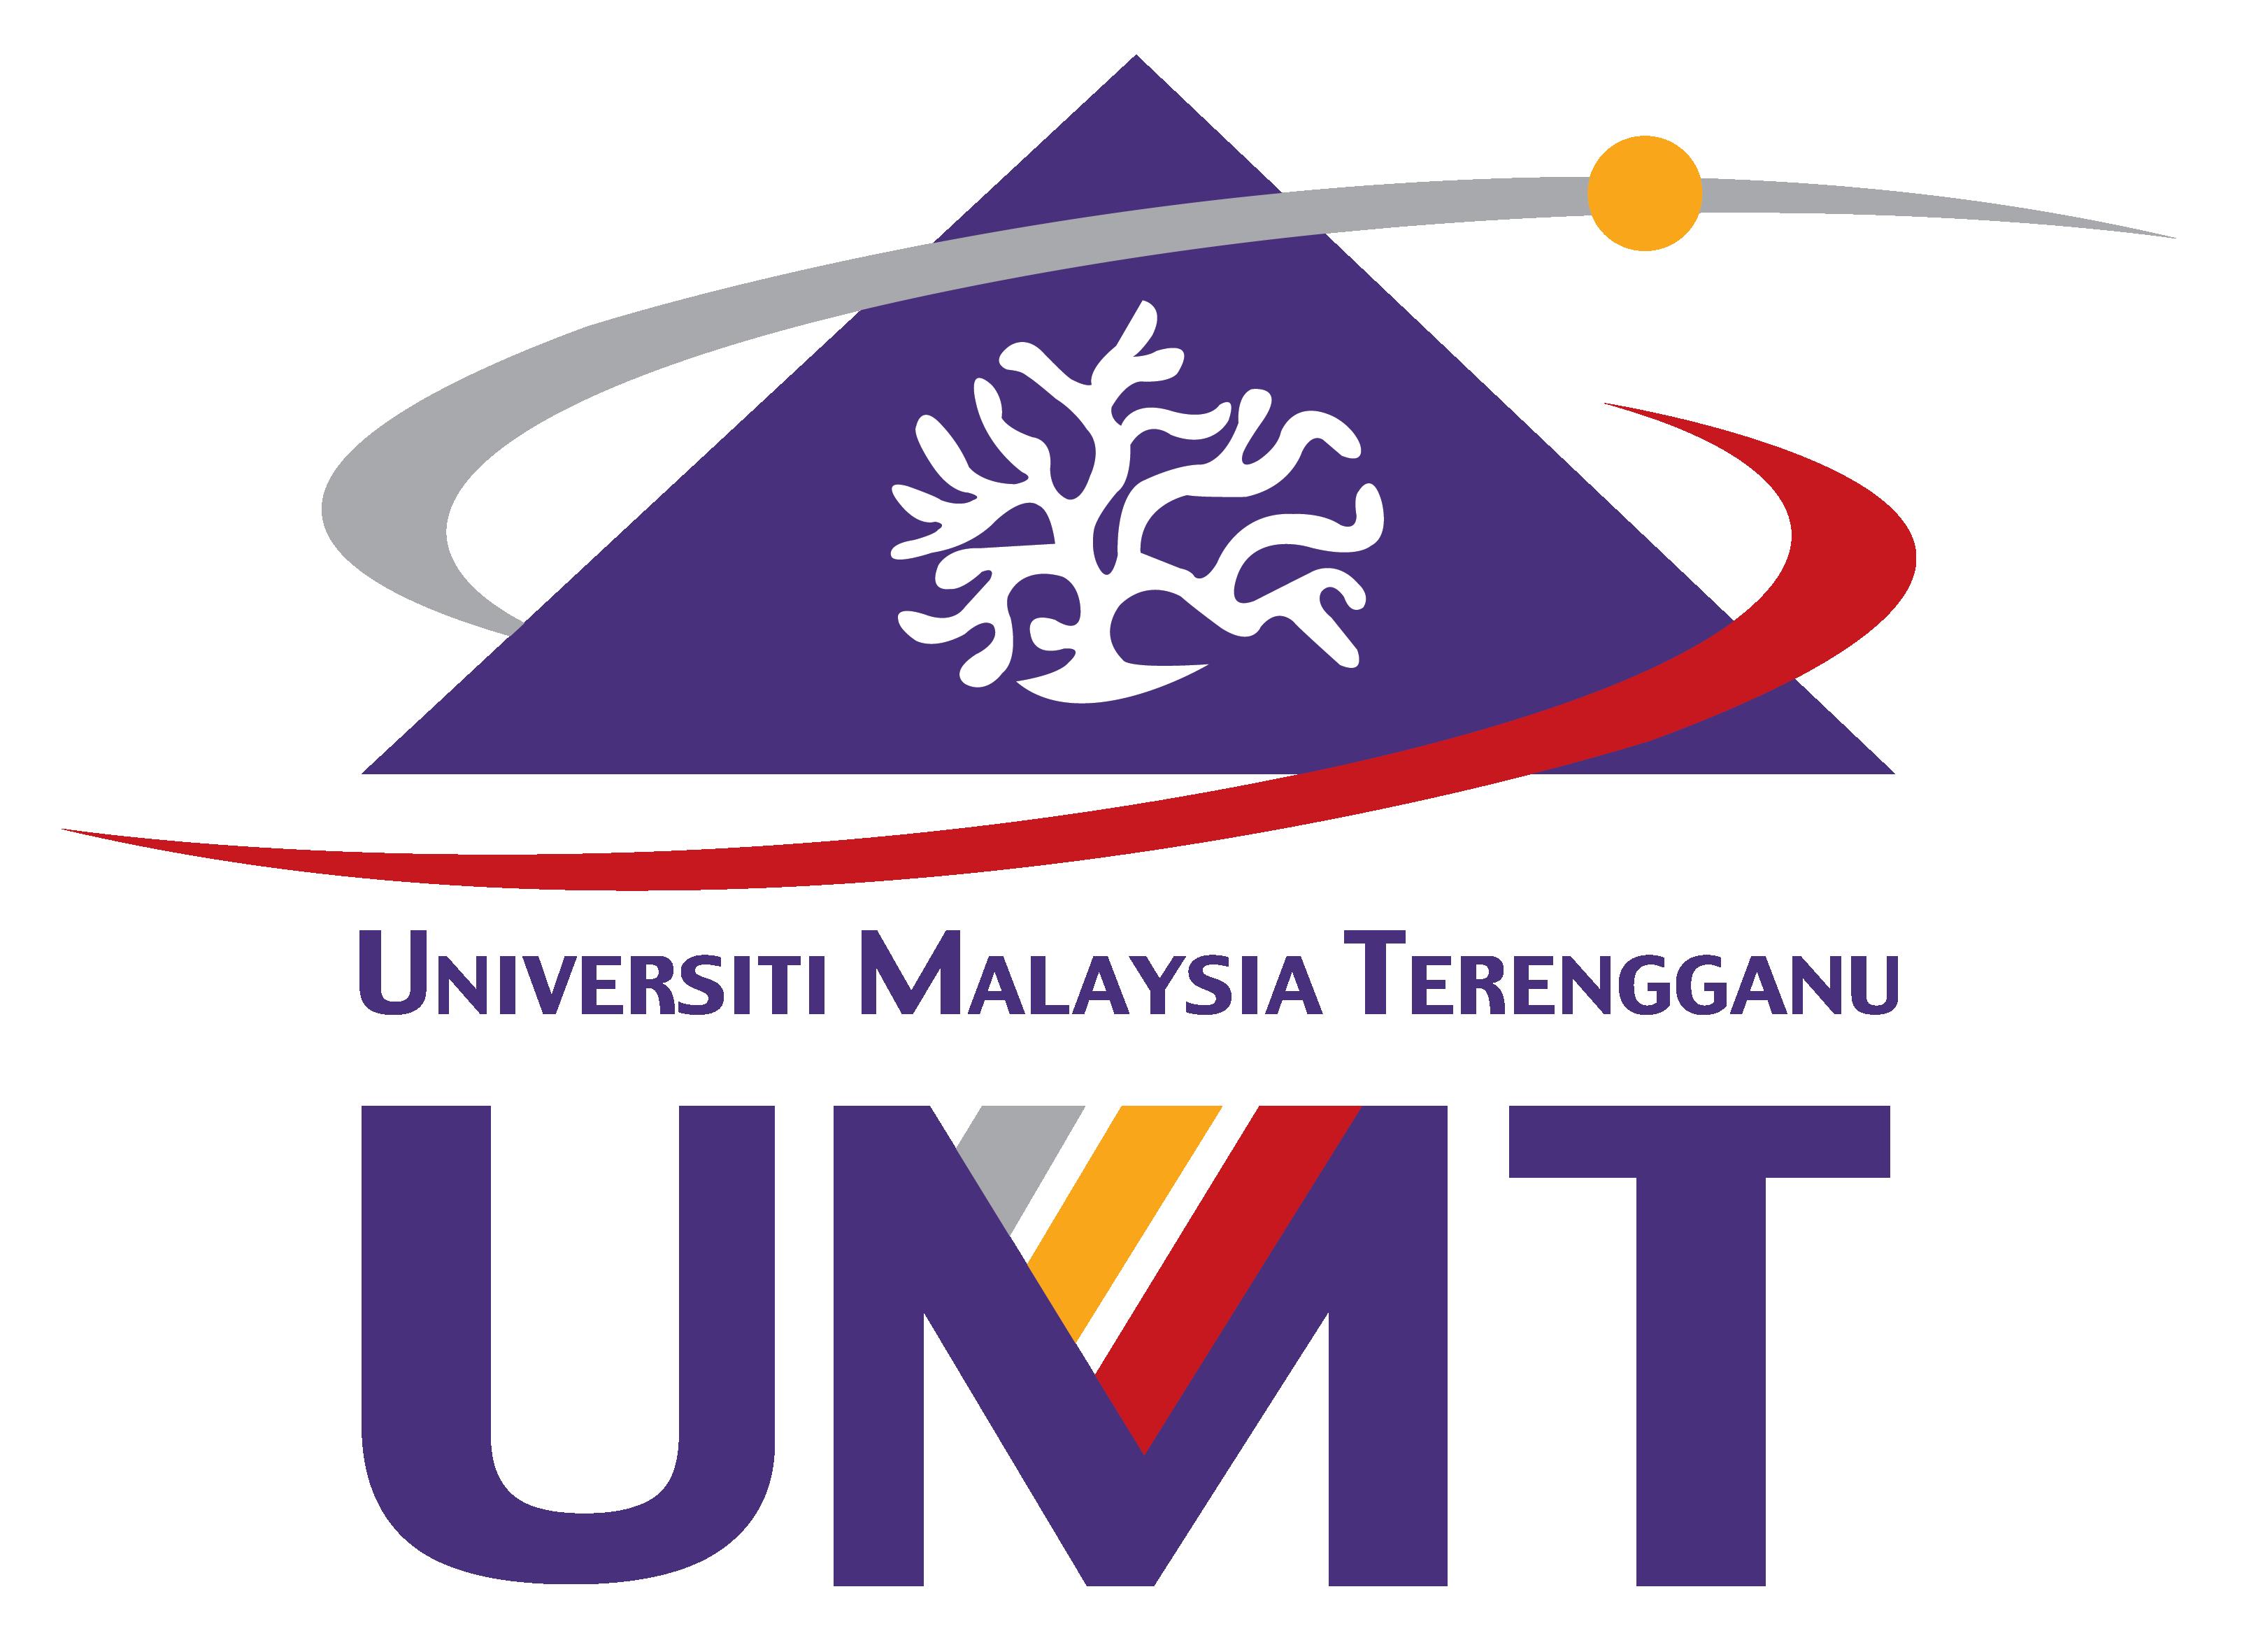 Universiti Malaysia Terengganu Wikipedia